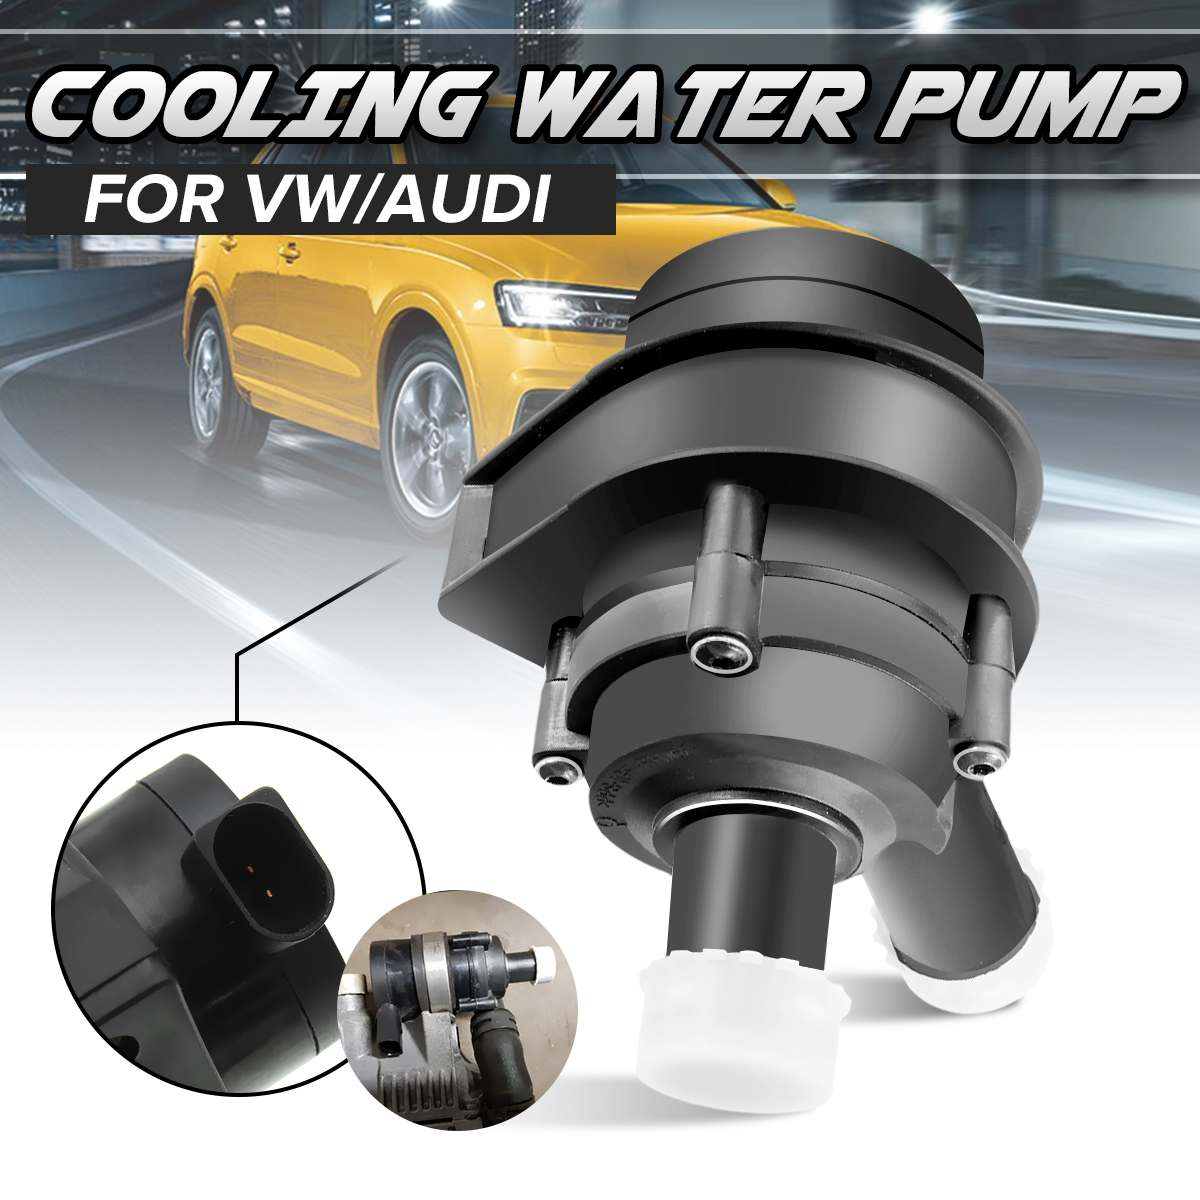 Bomba de agua auxiliar adicional 1K0965561J 1K0 965 561 J para VW Passat B5 B6 Jetta Golf CC para Audi A3